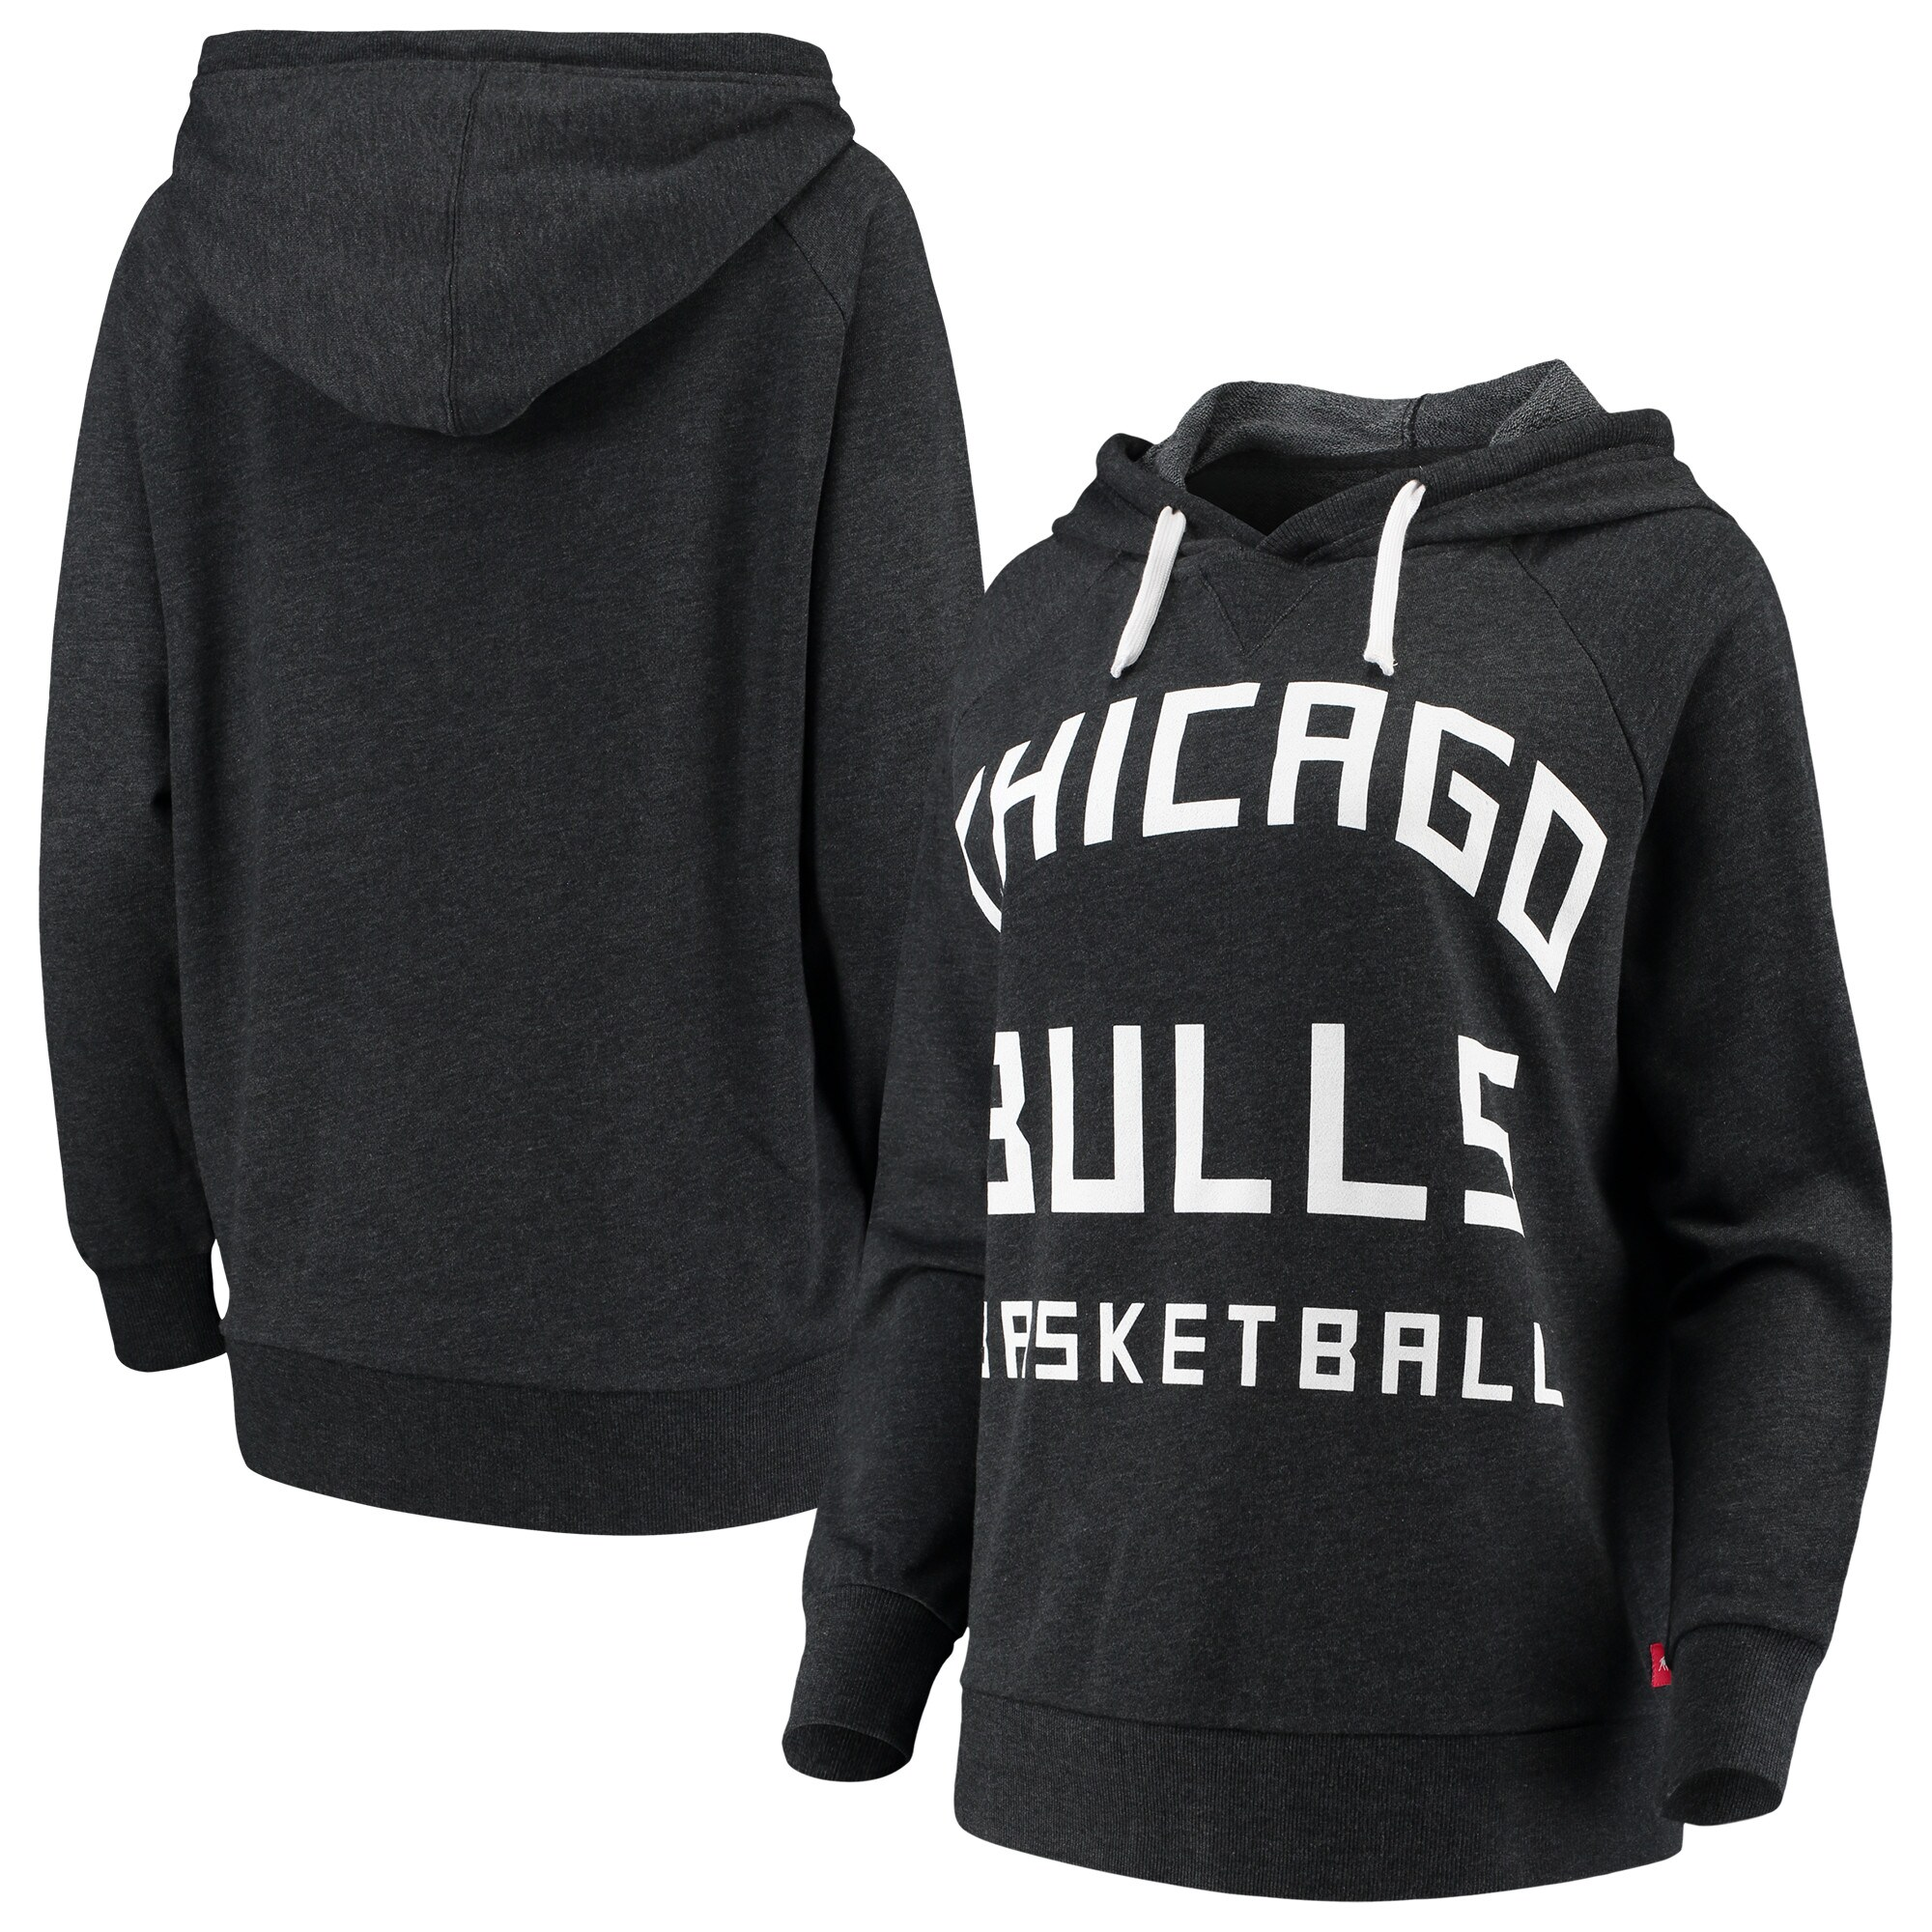 Chicago Bulls Sportiqe Women's Kylie French Terry Oversized Raglan Pullover Hoodie - Black